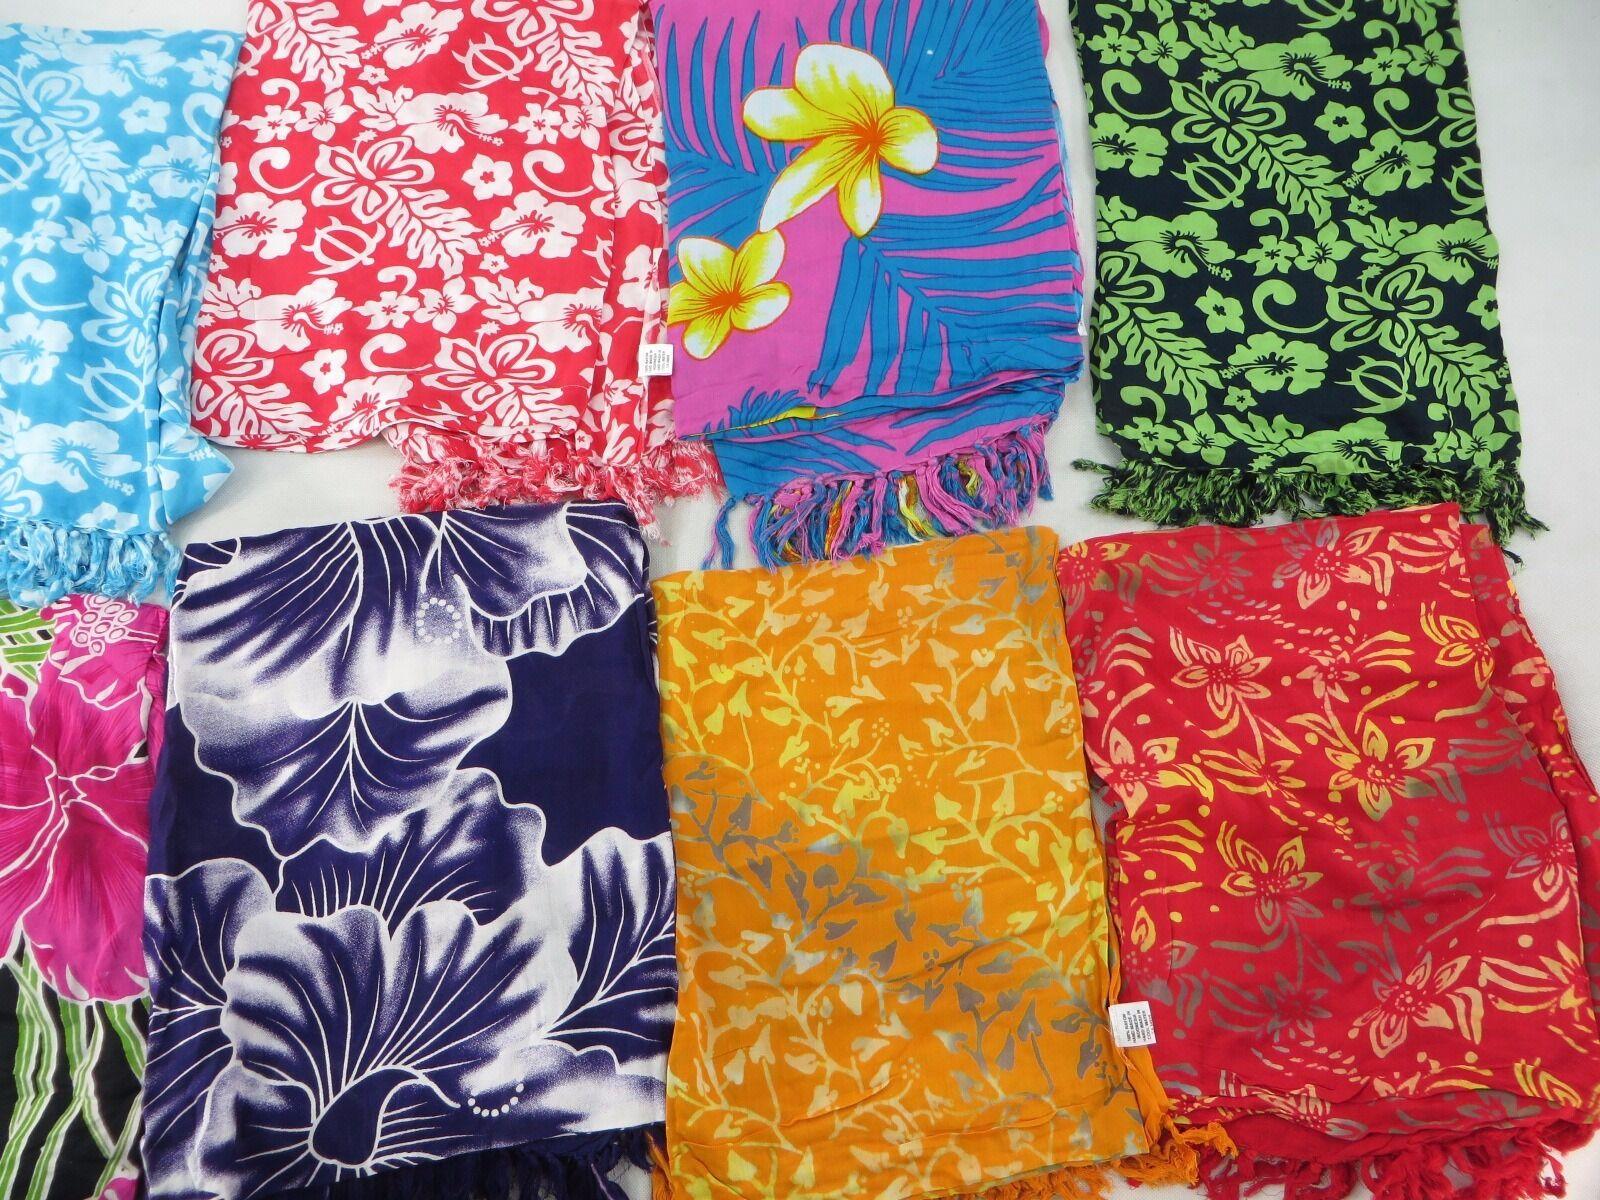 US SELLERLot of 10 hibiscus flower sarong swimsuit coverups pareo Hawaii Aloha